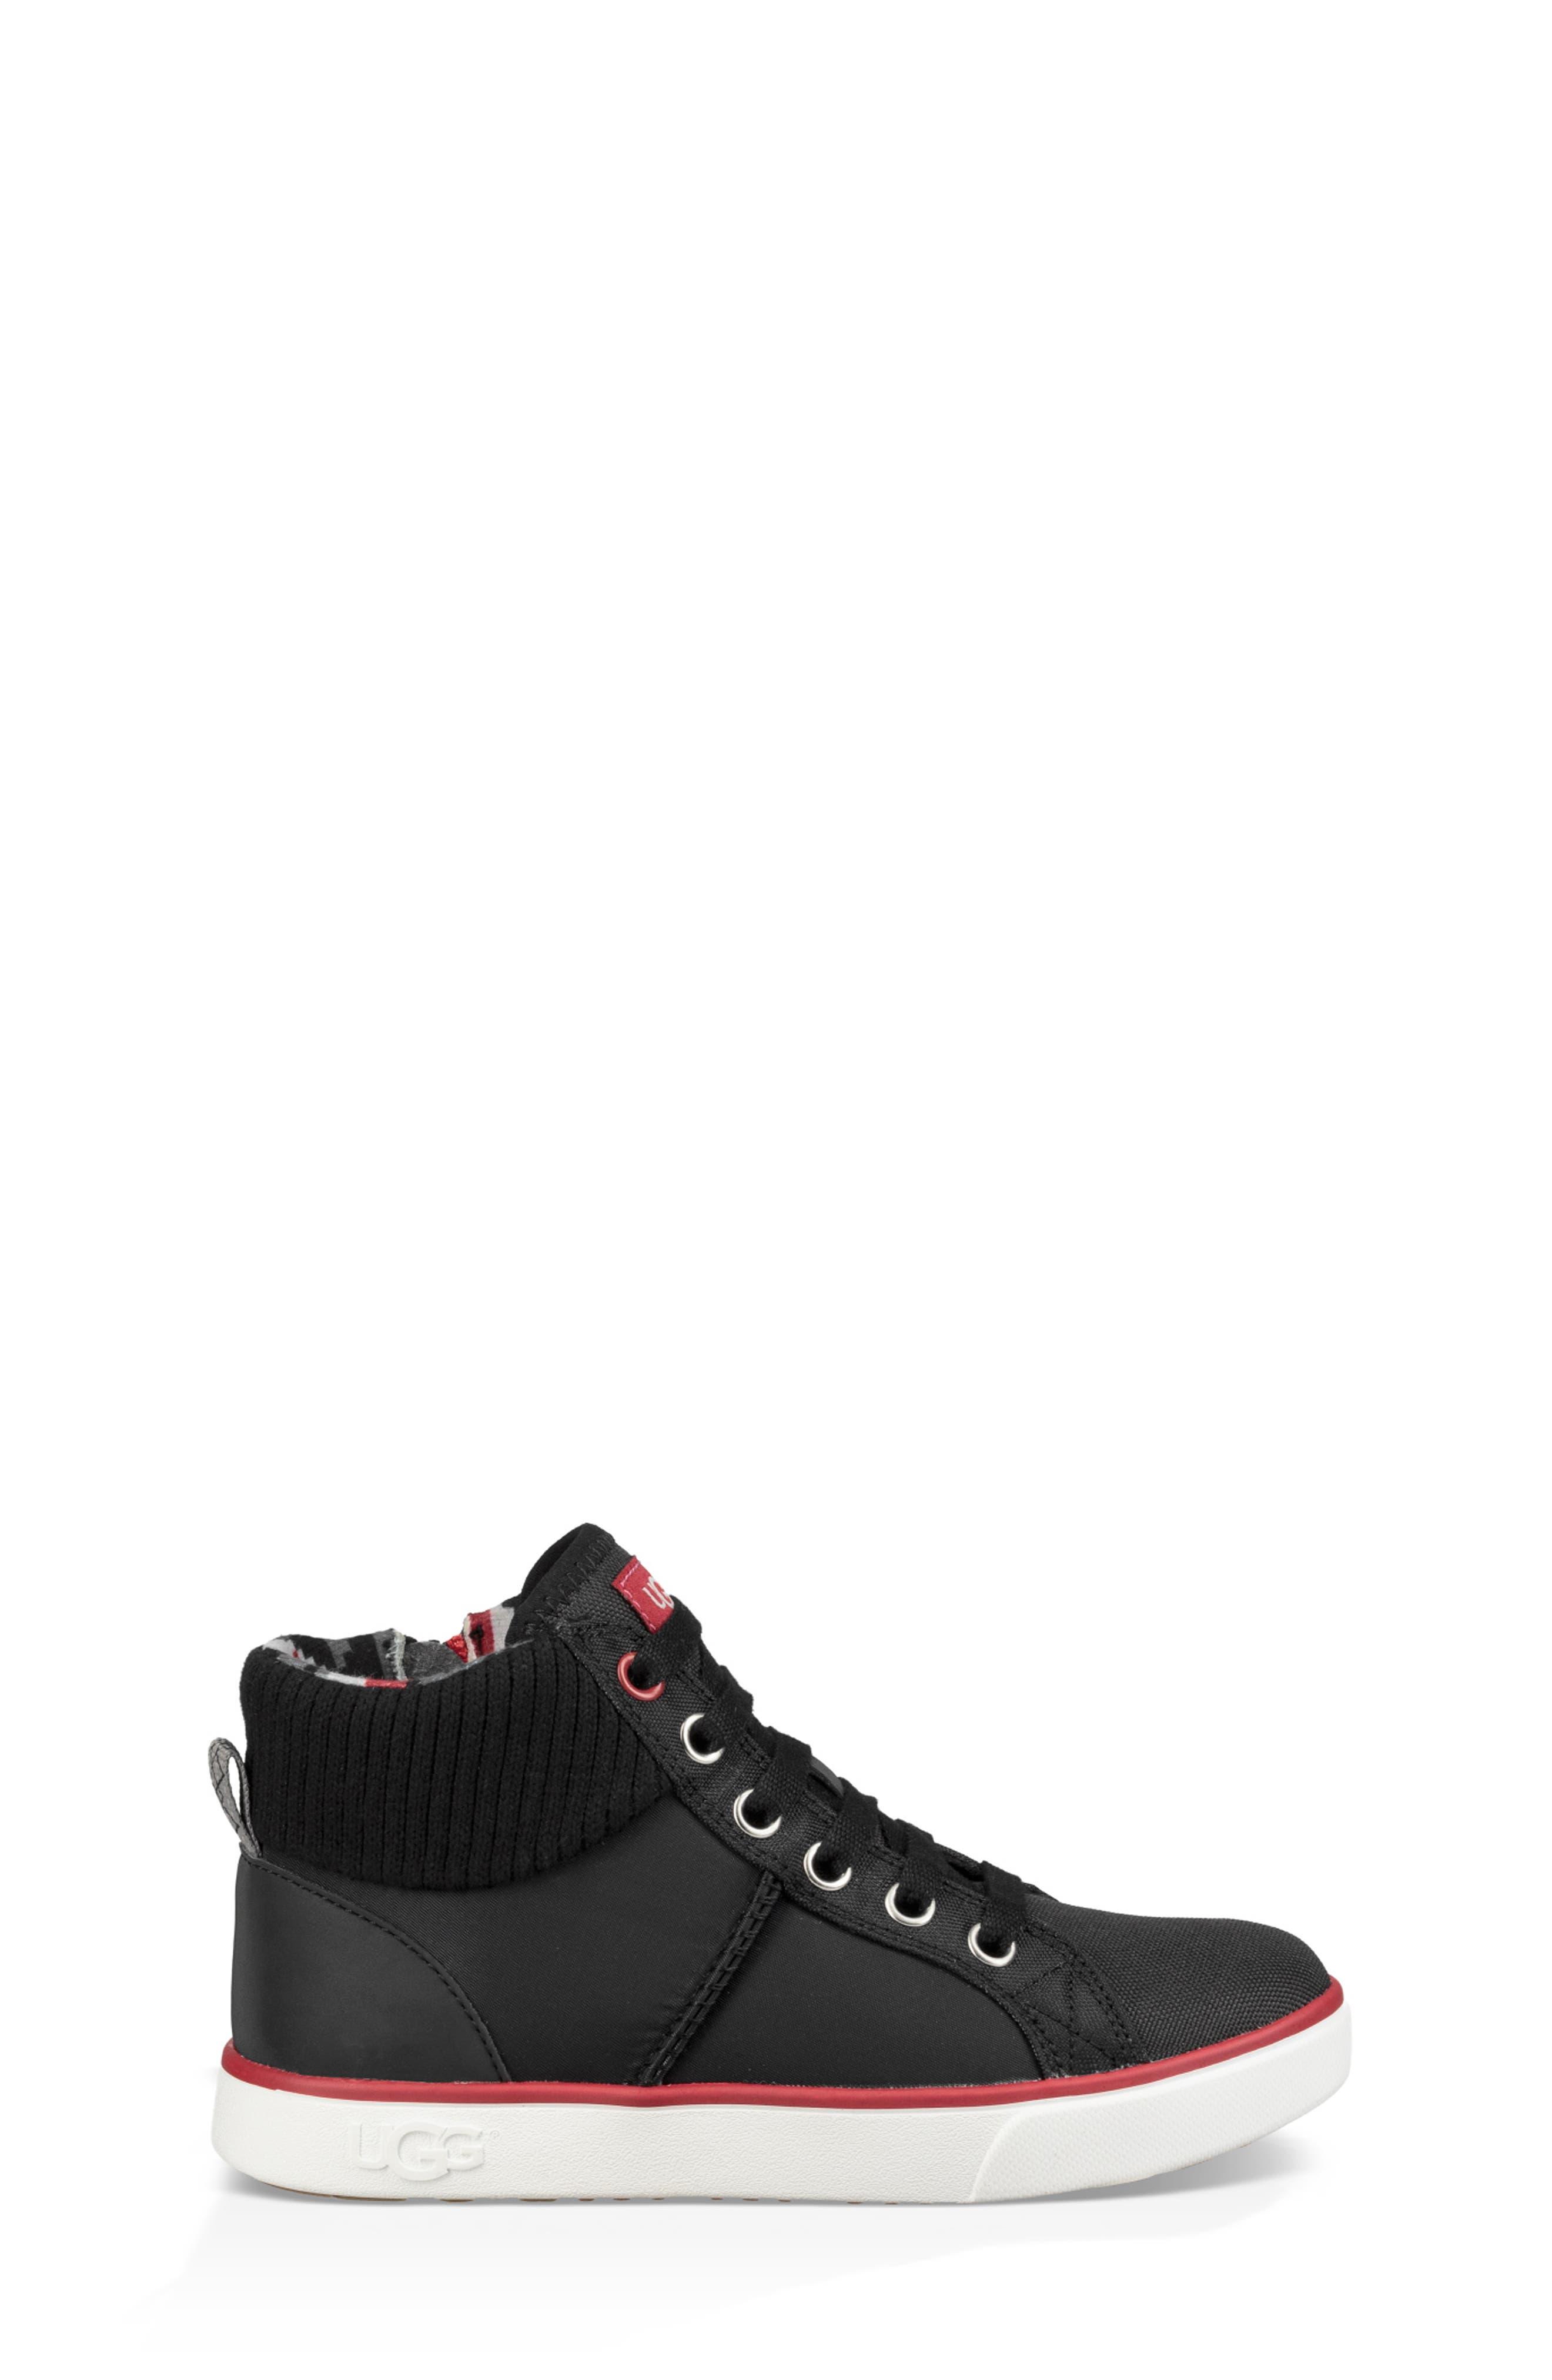 Boscoe Sneaker,                             Alternate thumbnail 3, color,                             001